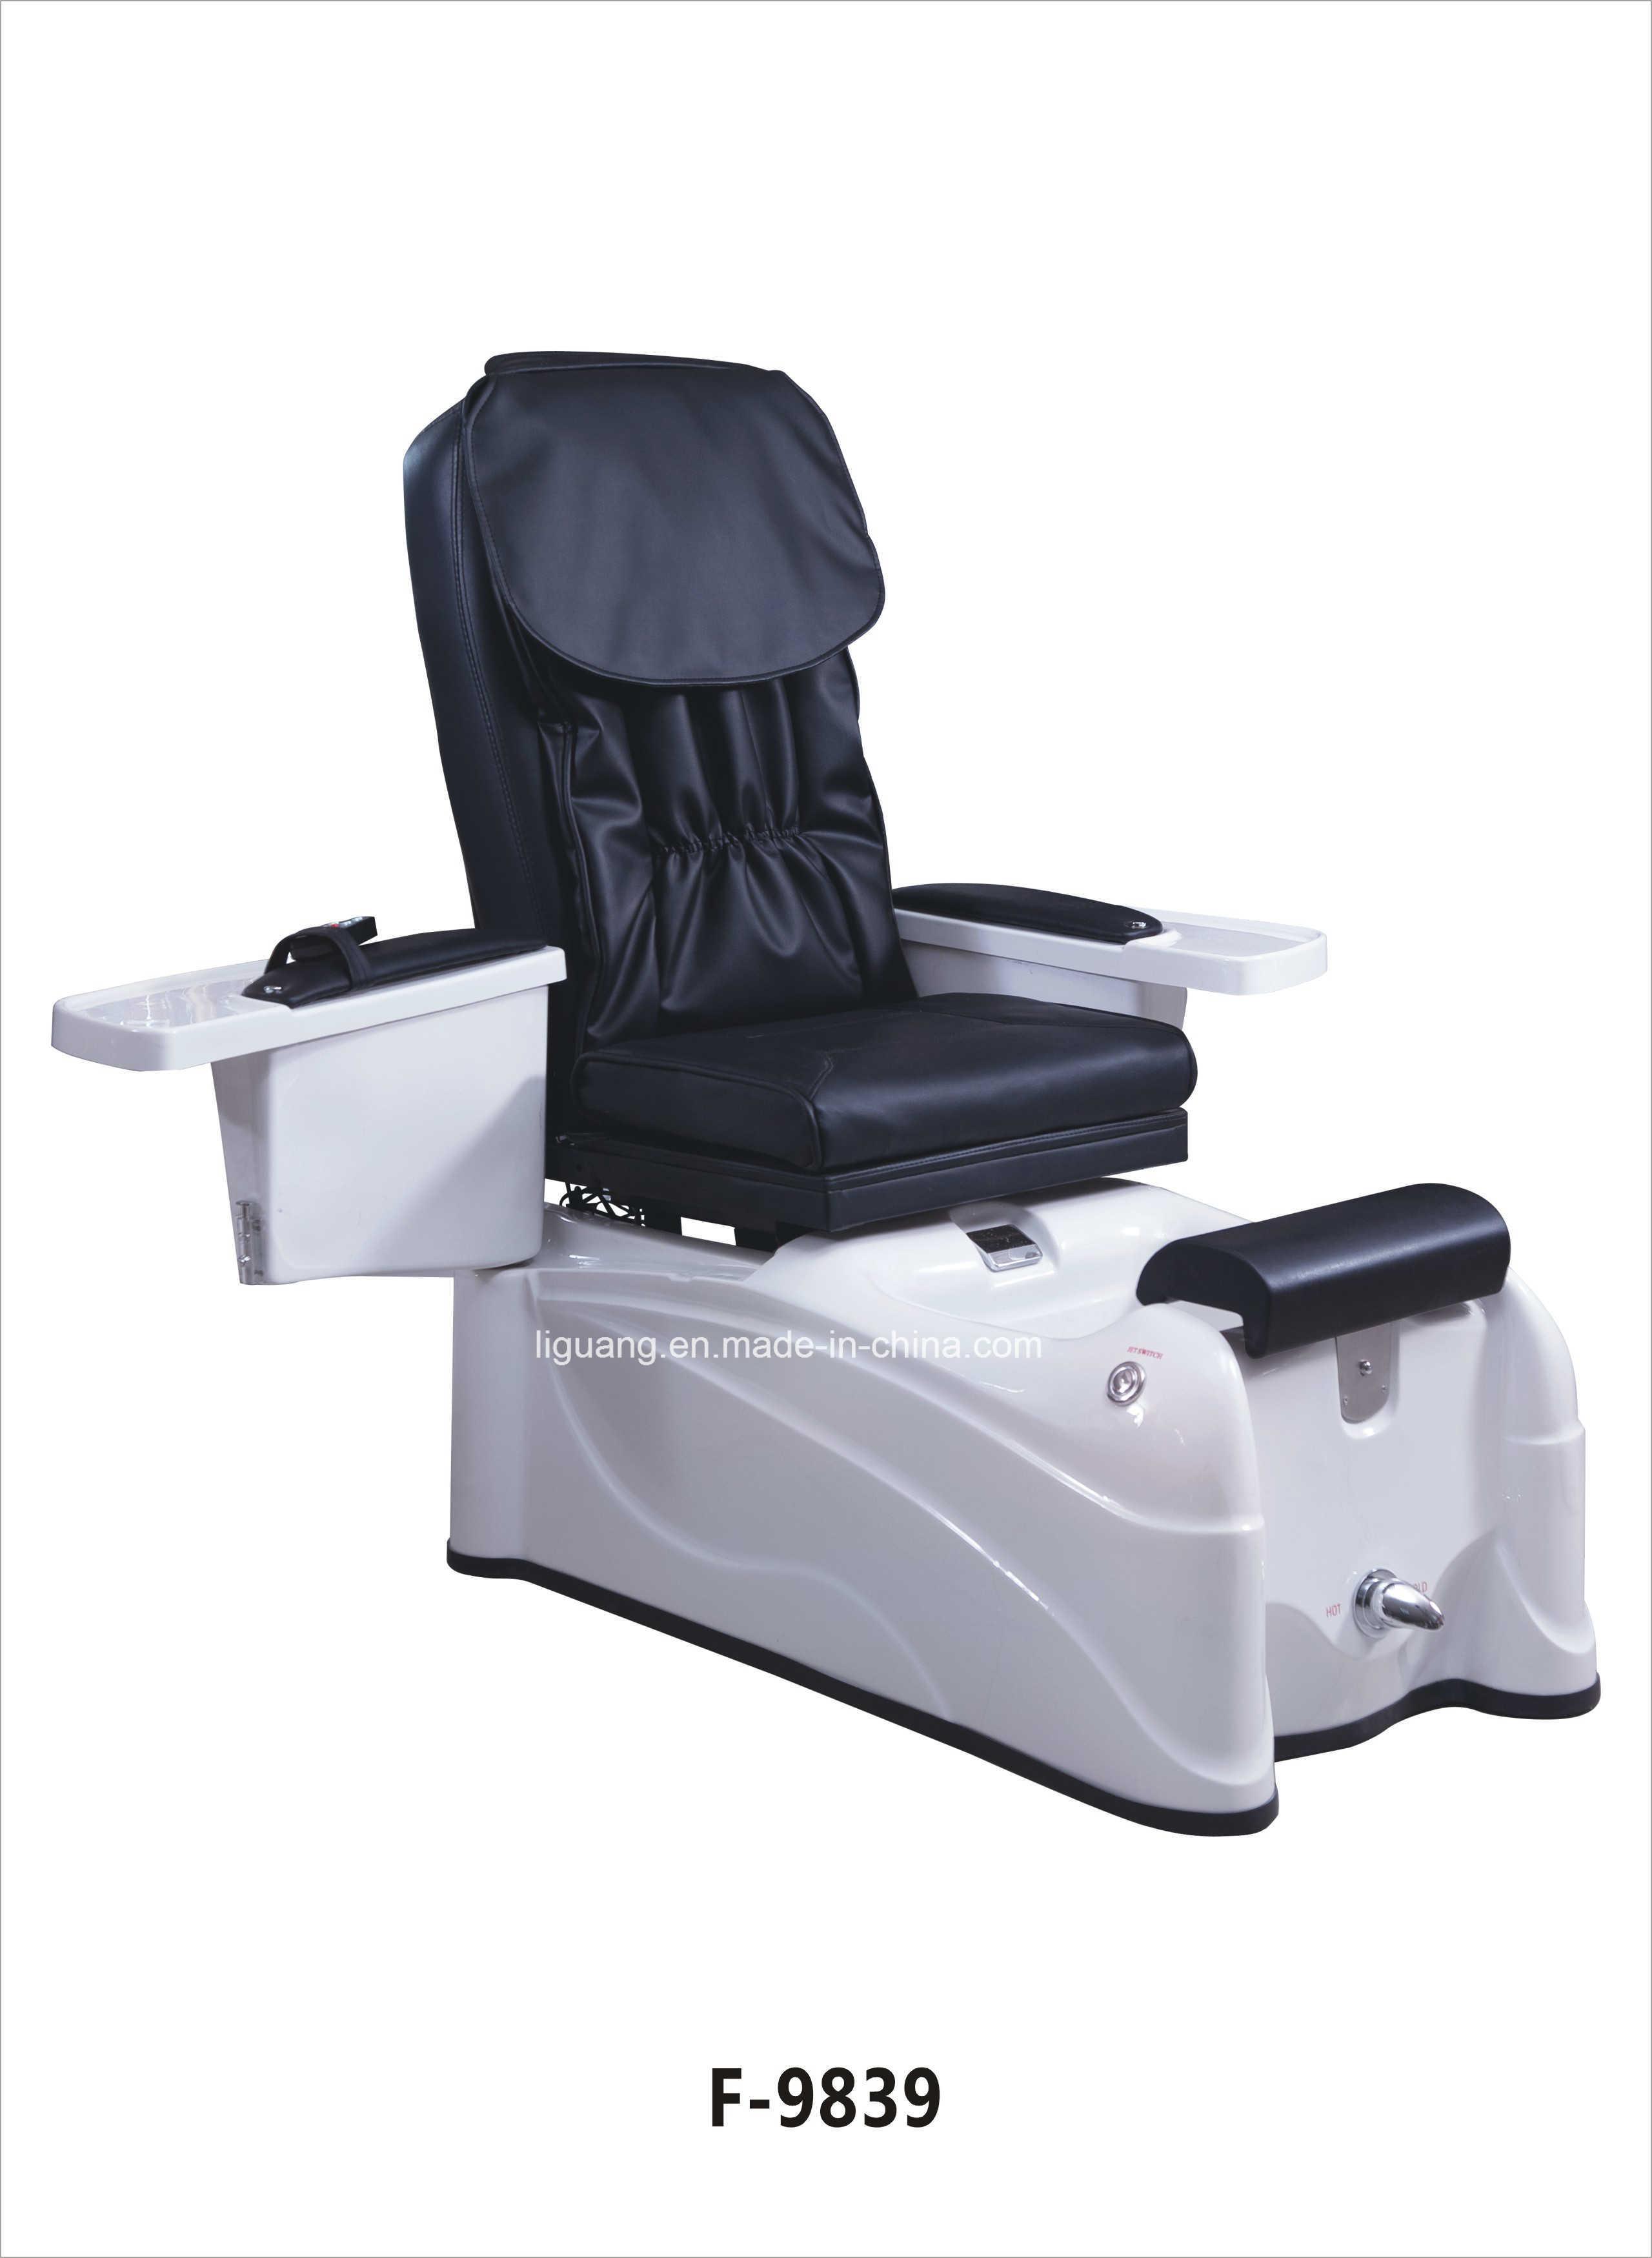 Jacuzzi Pump For Pedicure Chair